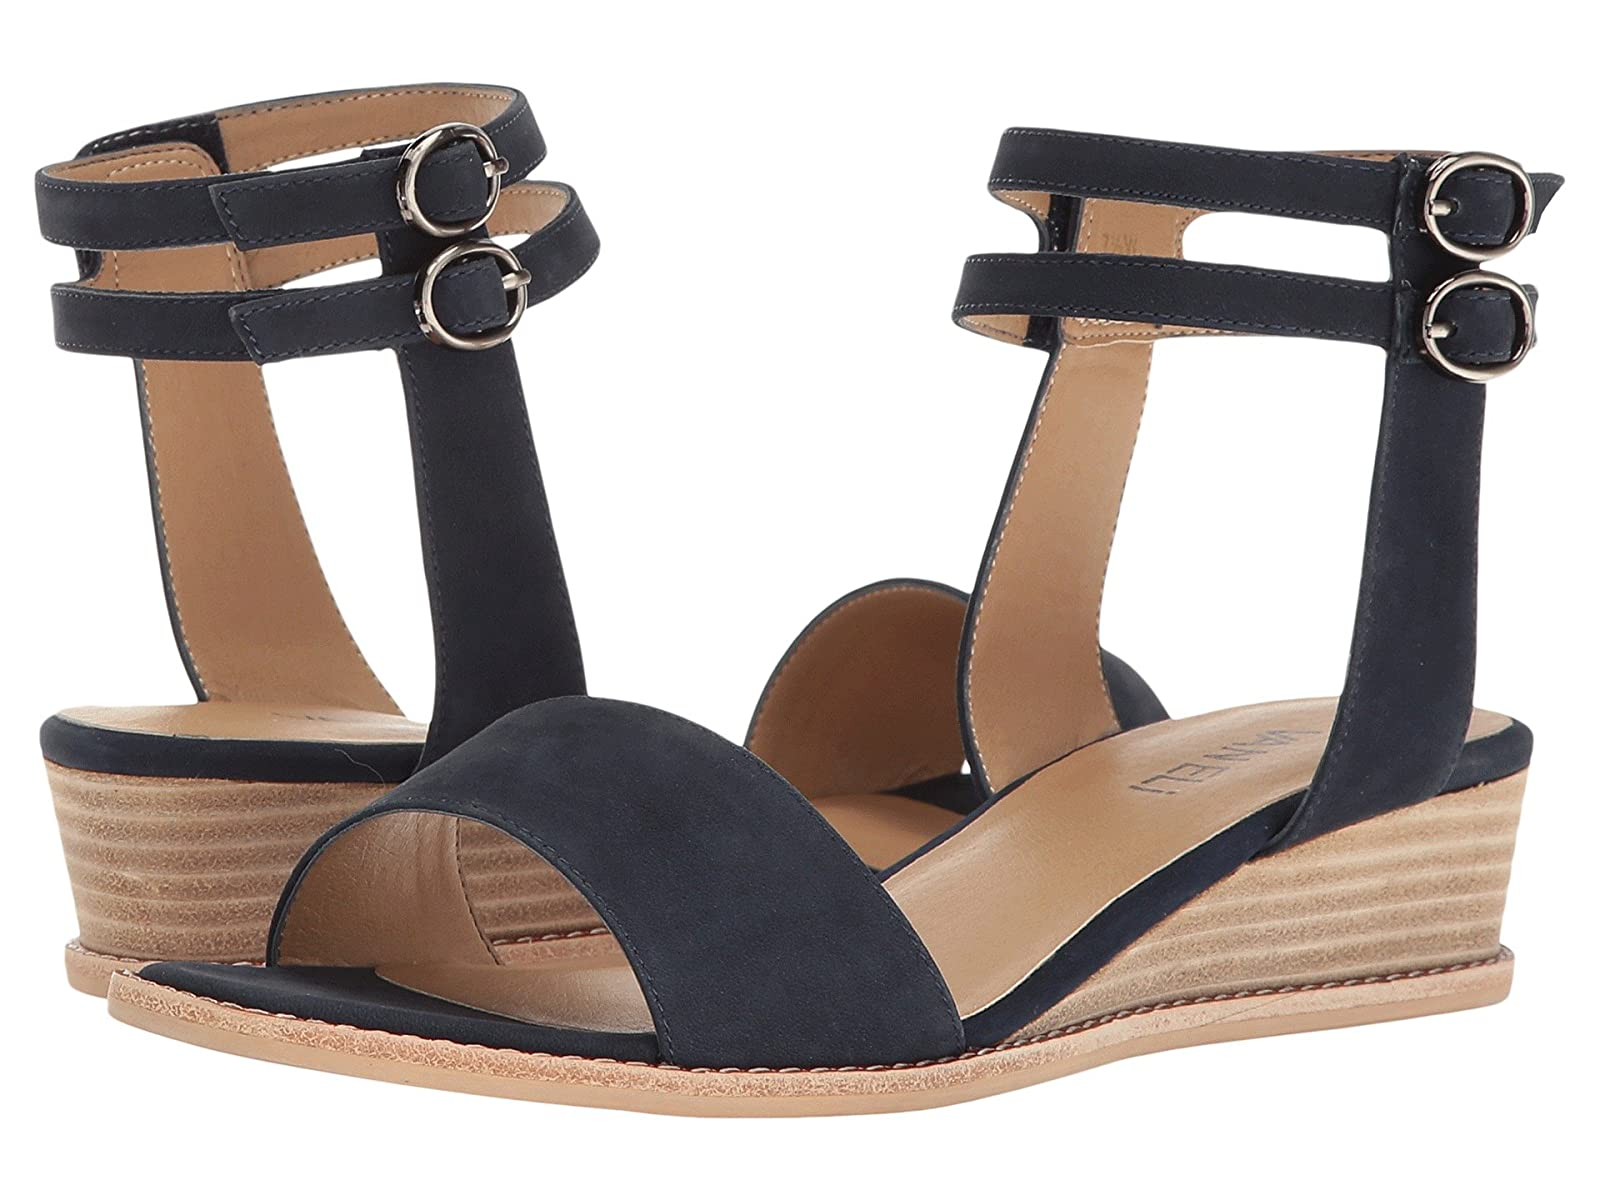 Vaneli JaritaCheap and distinctive eye-catching shoes